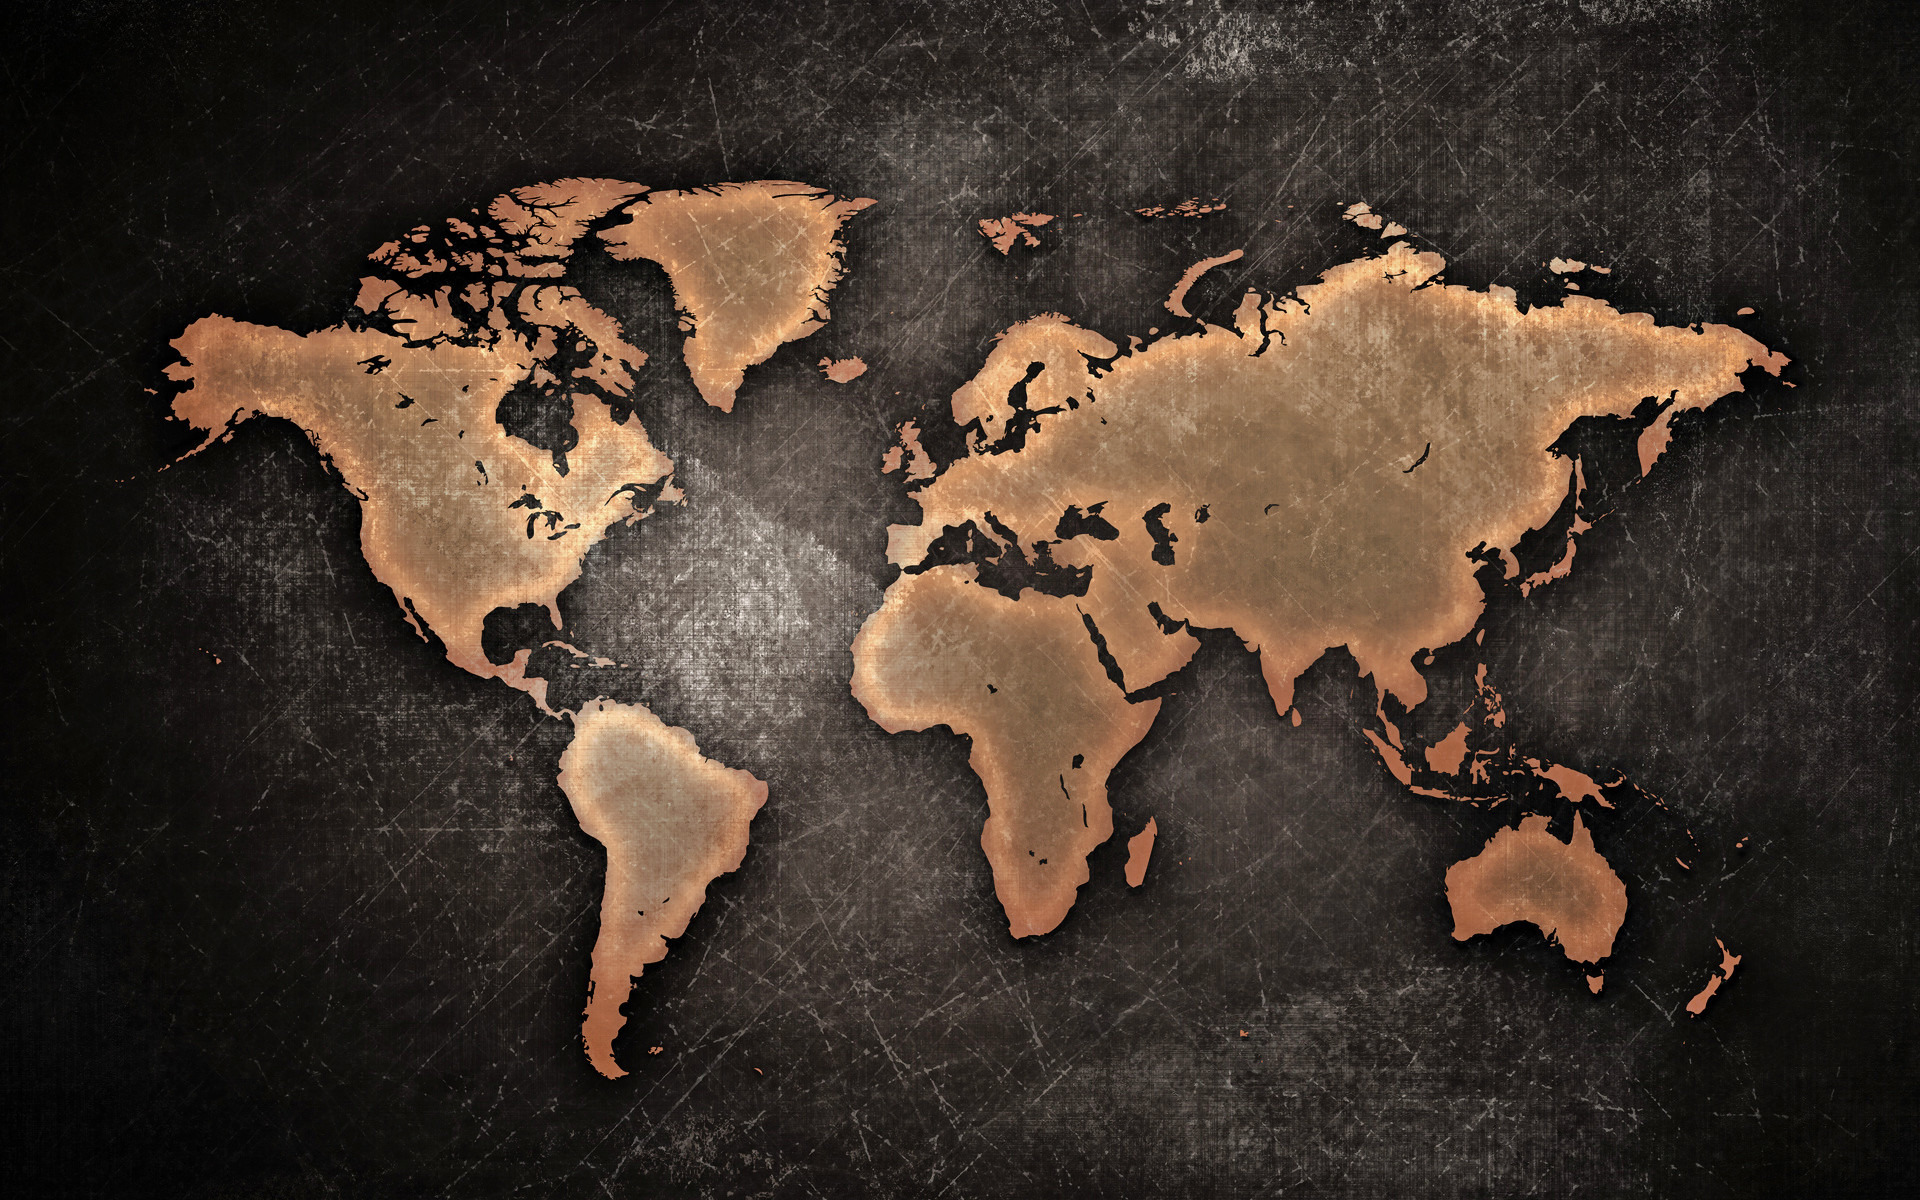 World map desktop background 1920x1200 grunge world map hd desktop wallpaper download country gumiabroncs Images